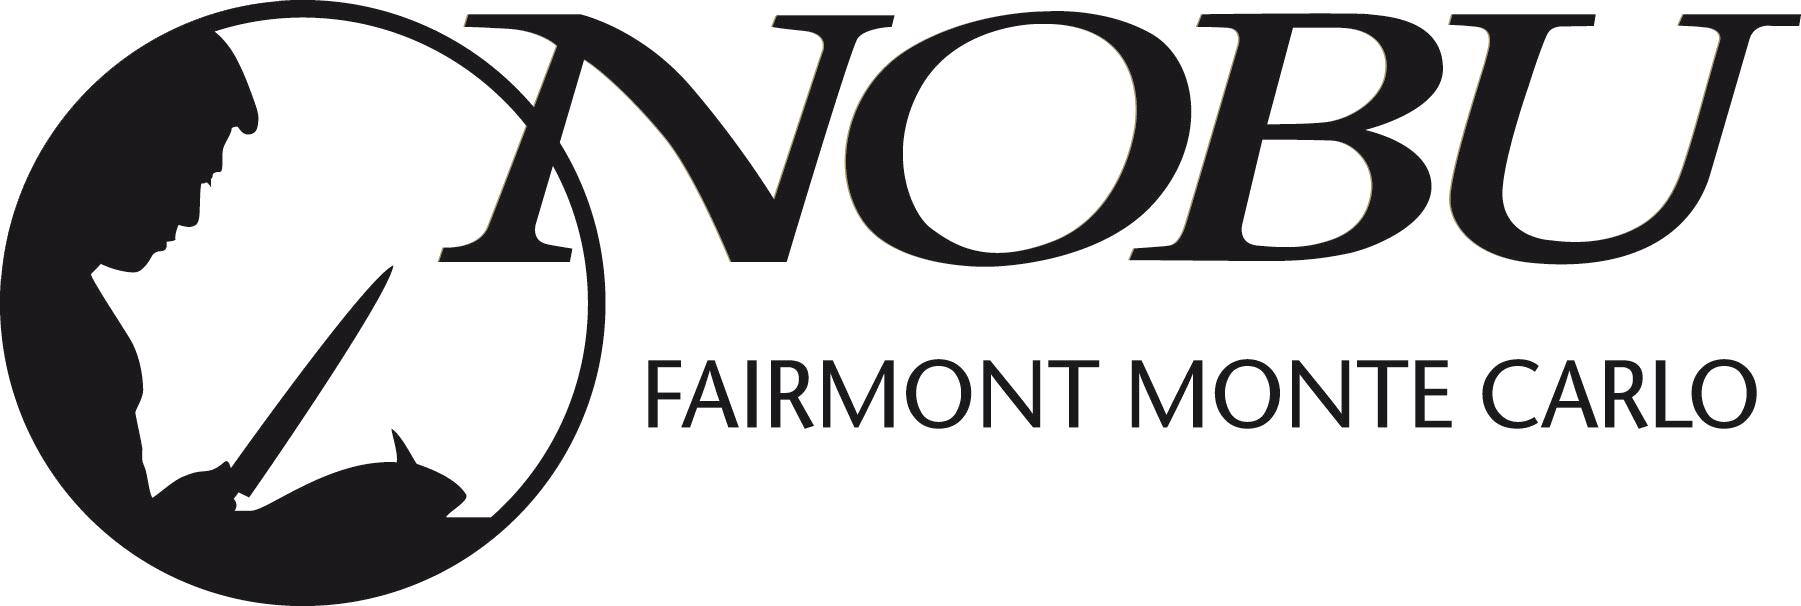 Nobu Fairmont Monte Carlo RestaurantLogo of